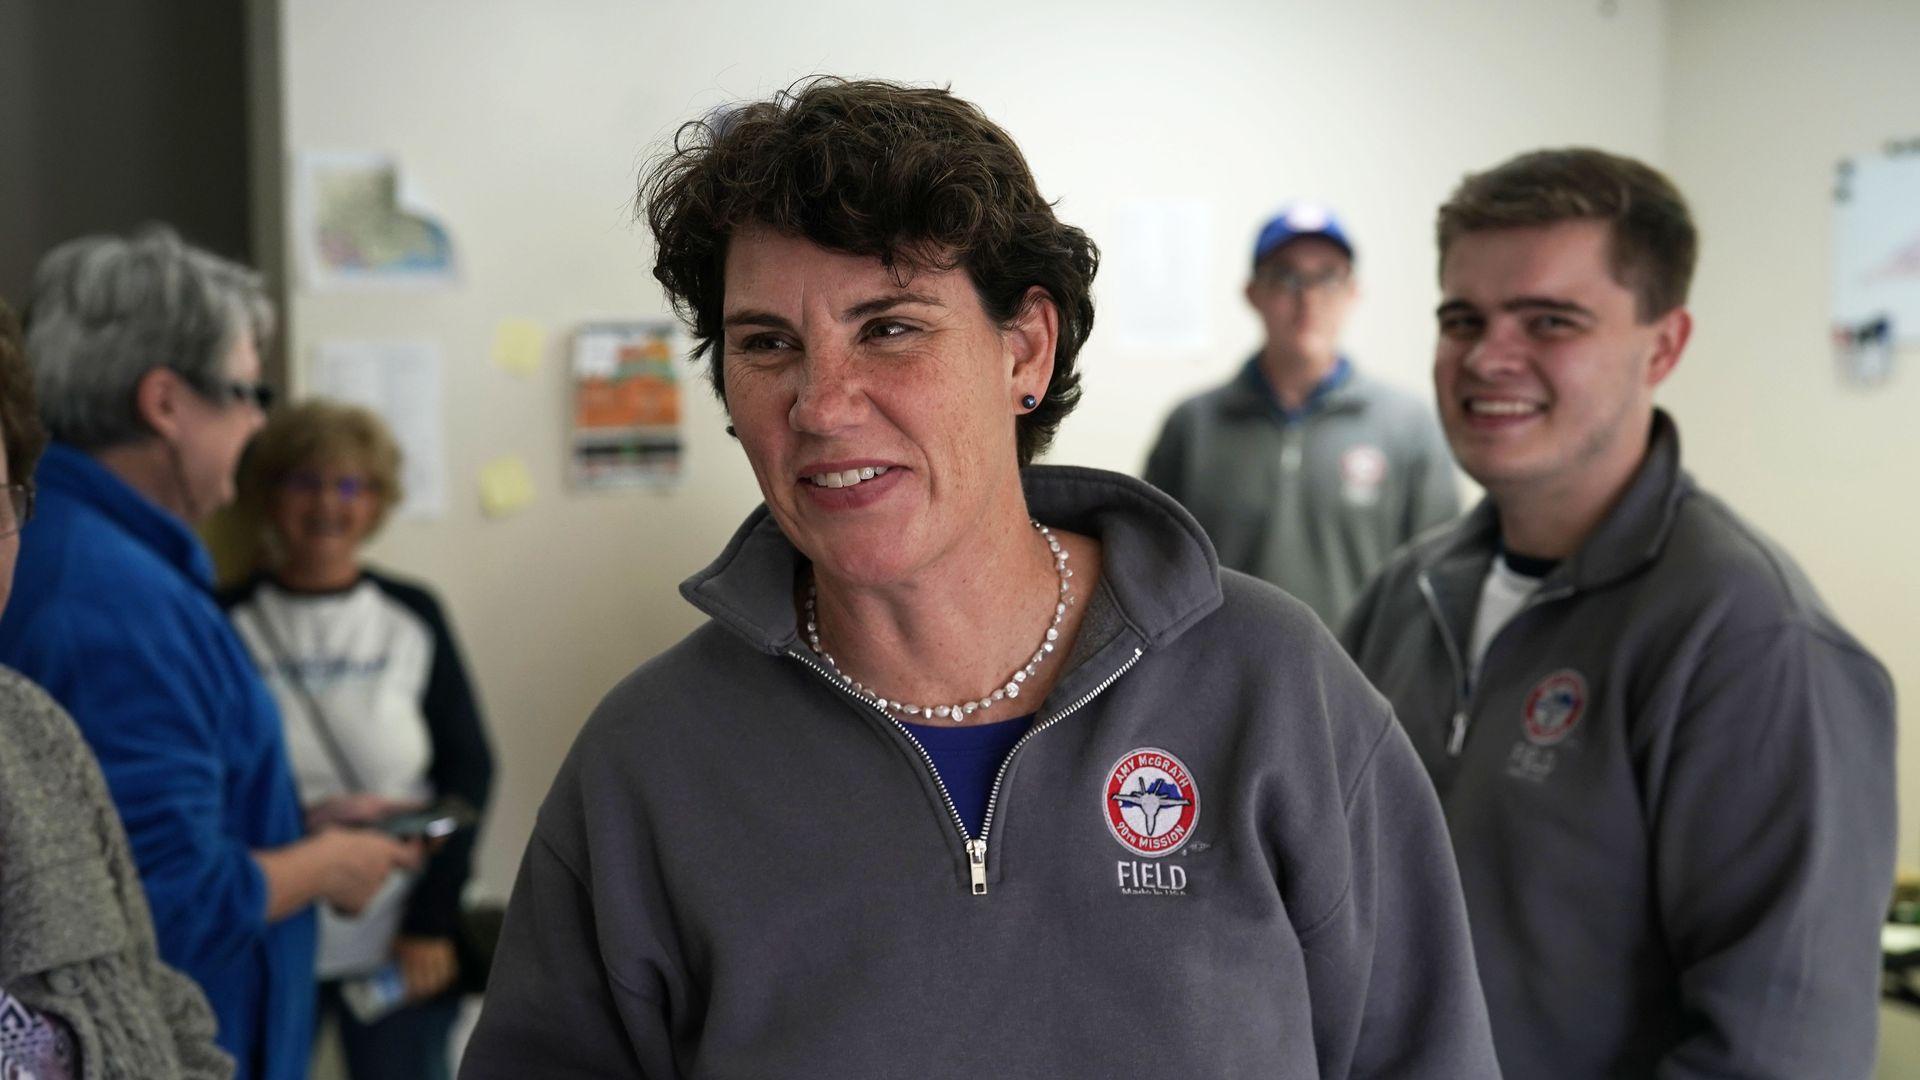 Kentucky Democrat Amy McGrath